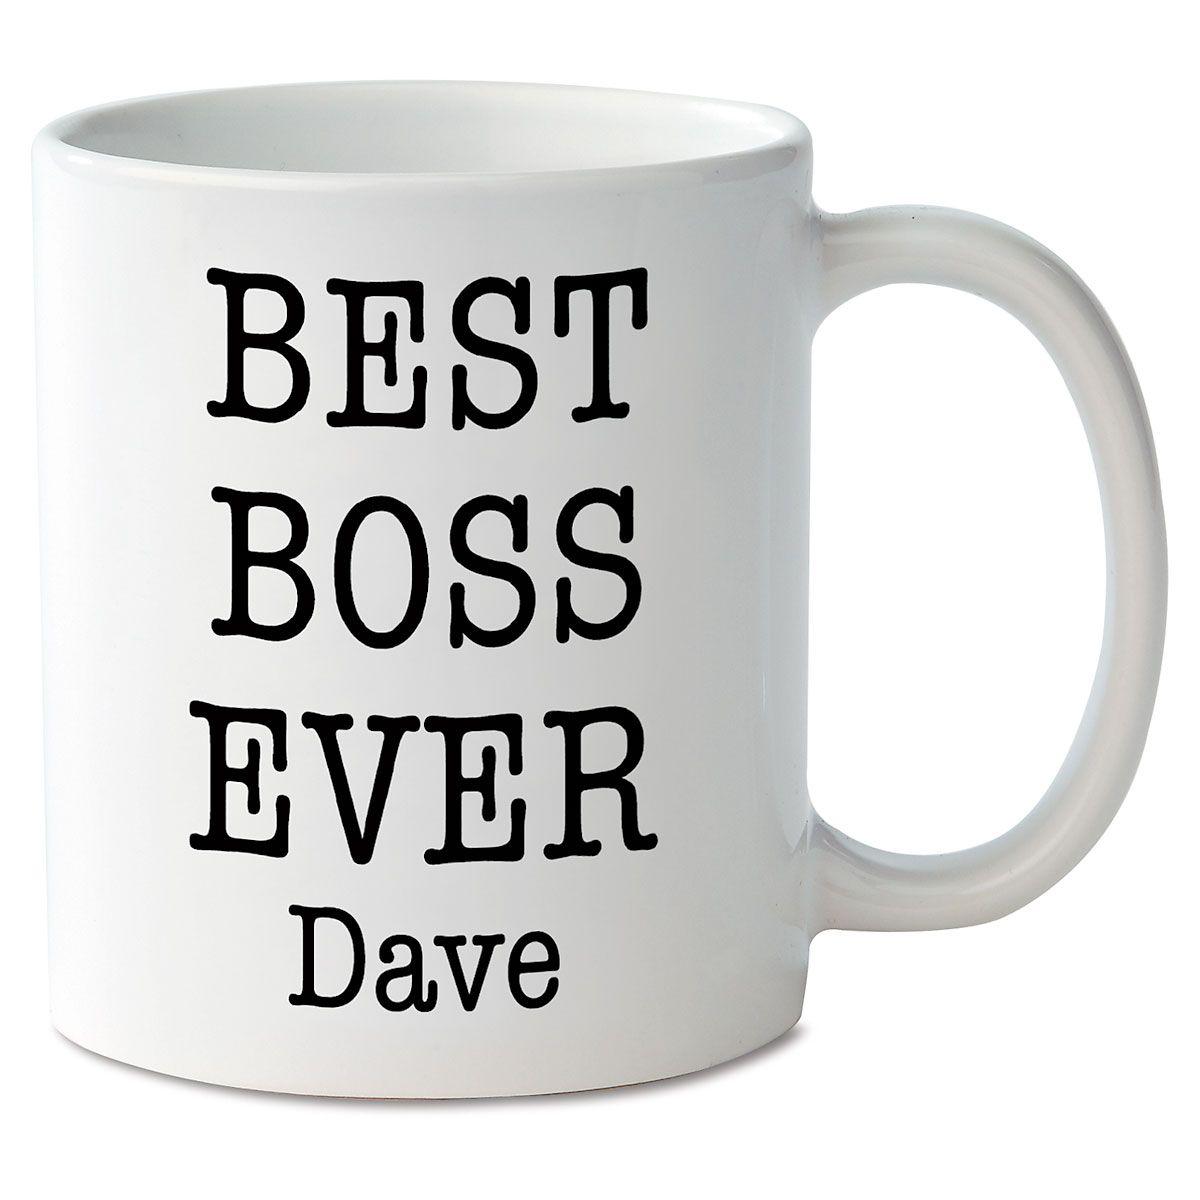 Best Boss Ever Personalized Mug